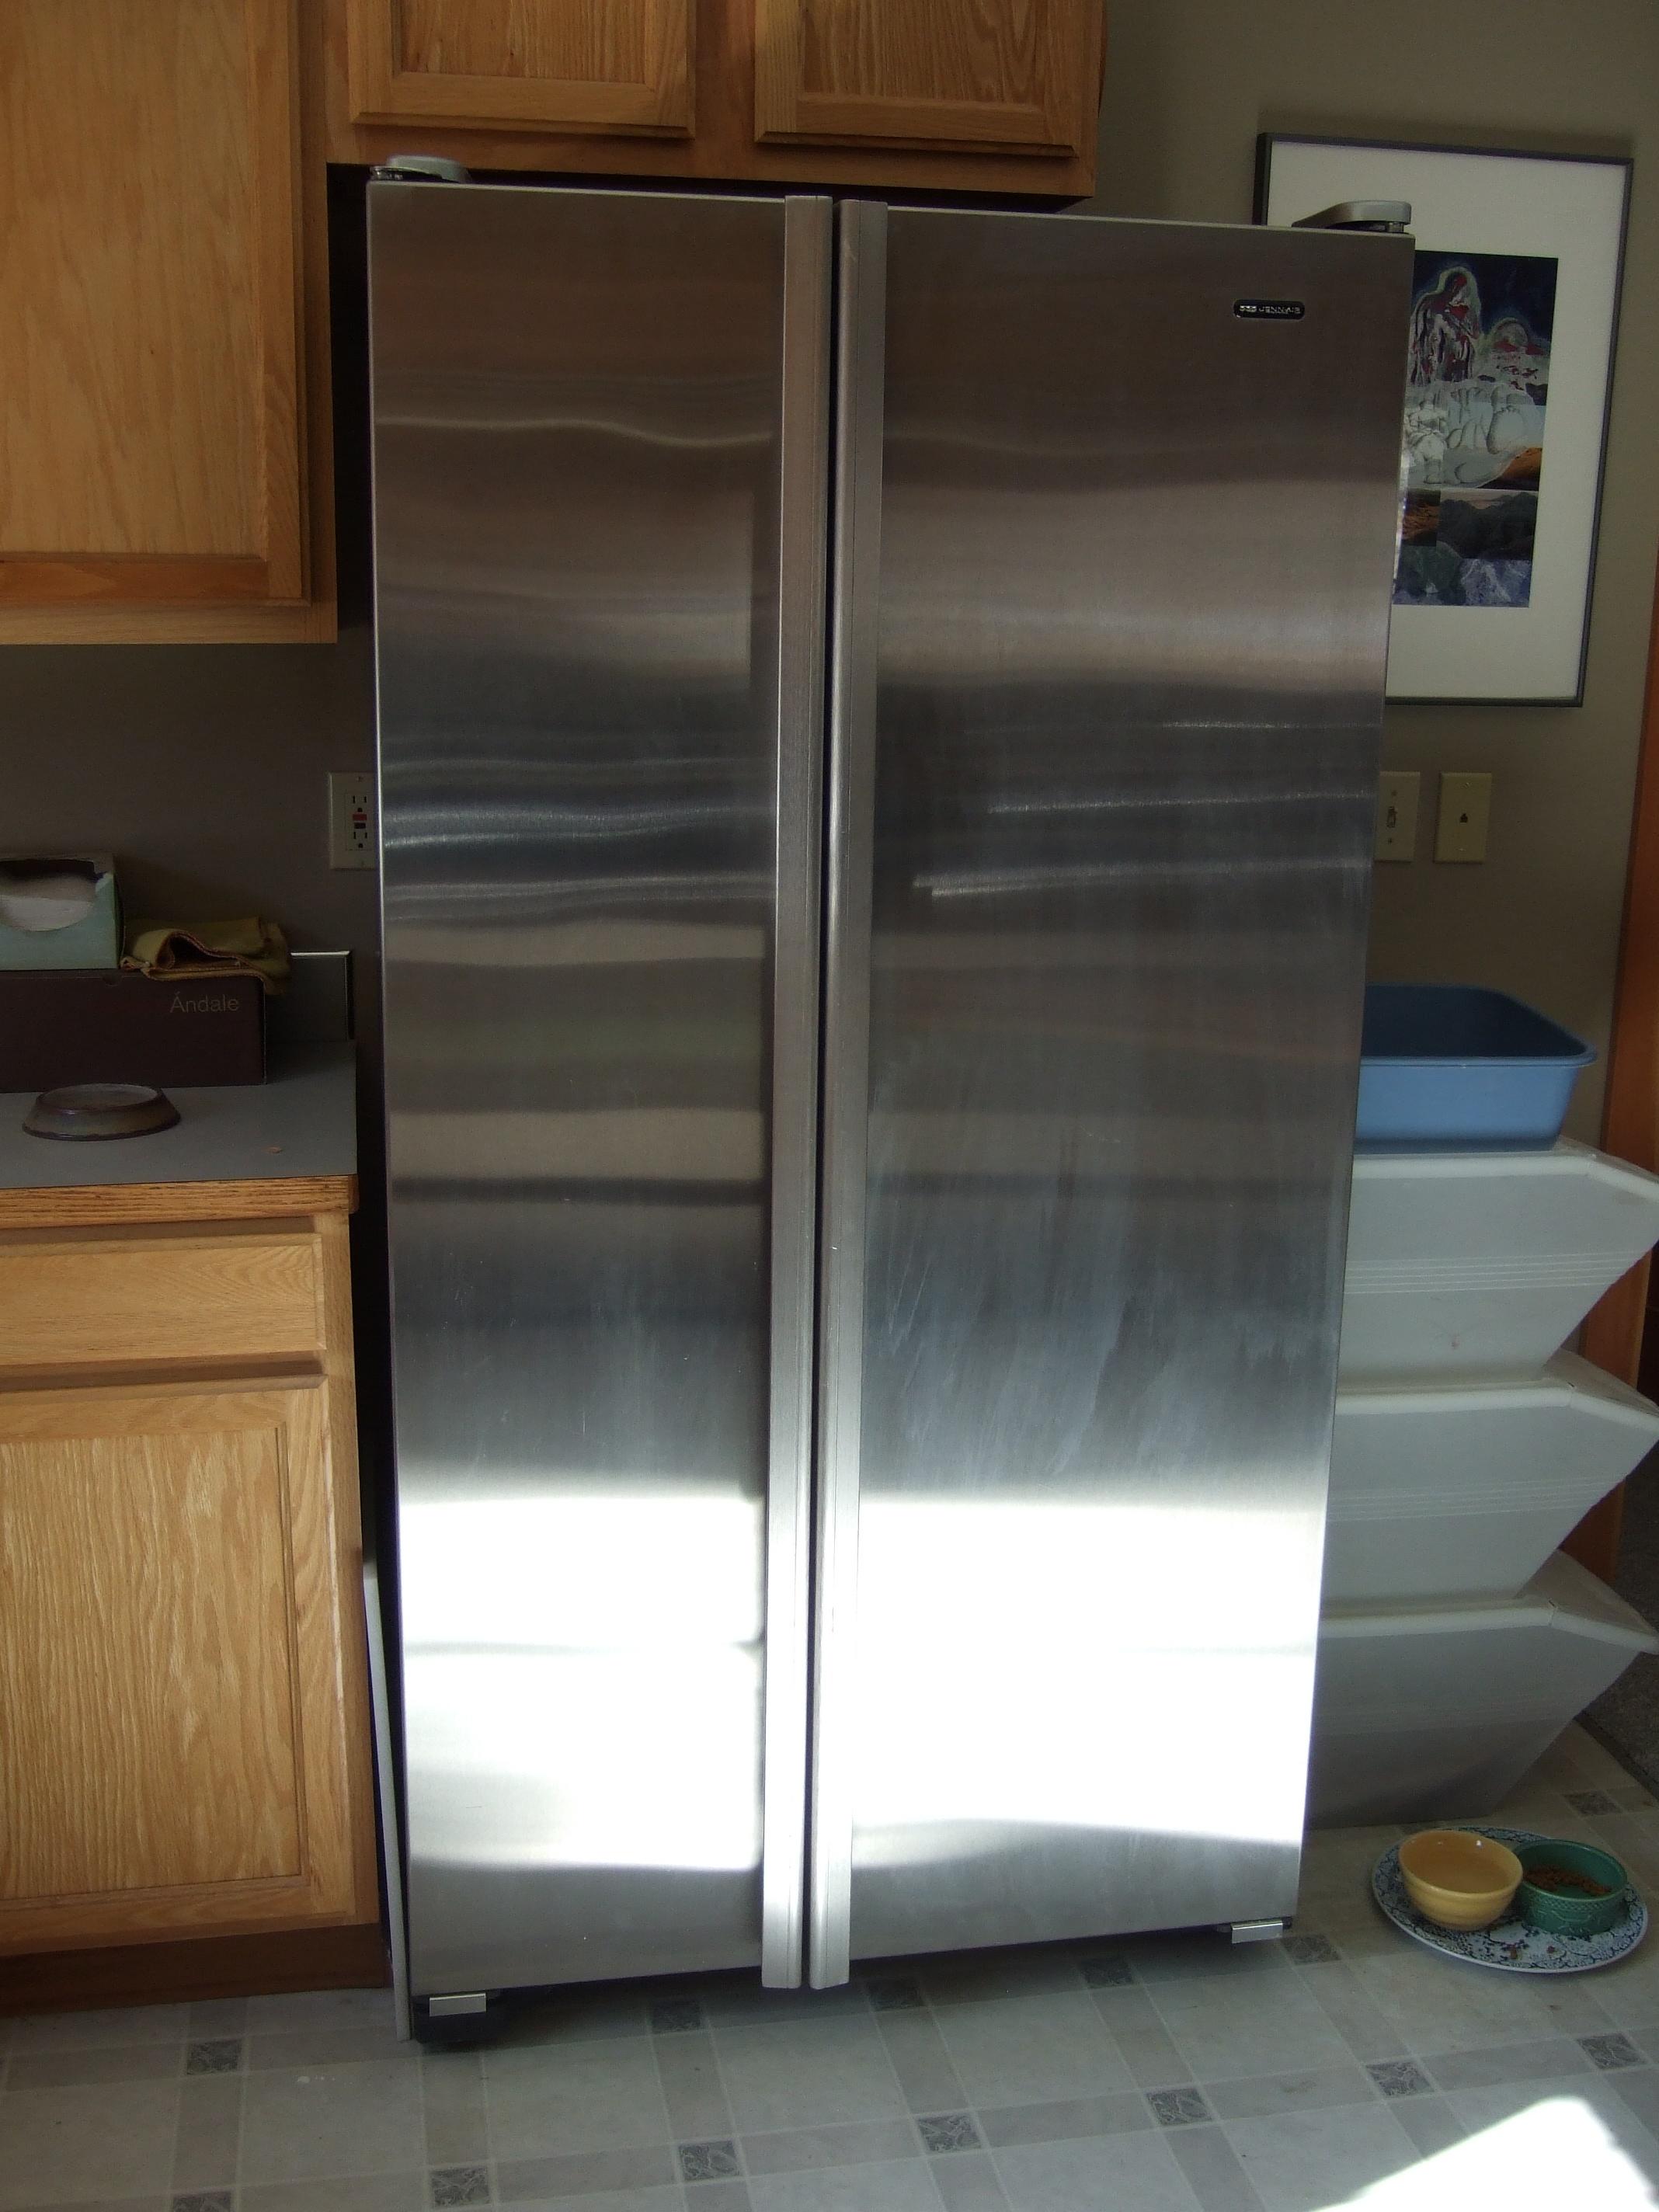 jenn air refrigerator side by side. whereas jenn air refrigerator side by